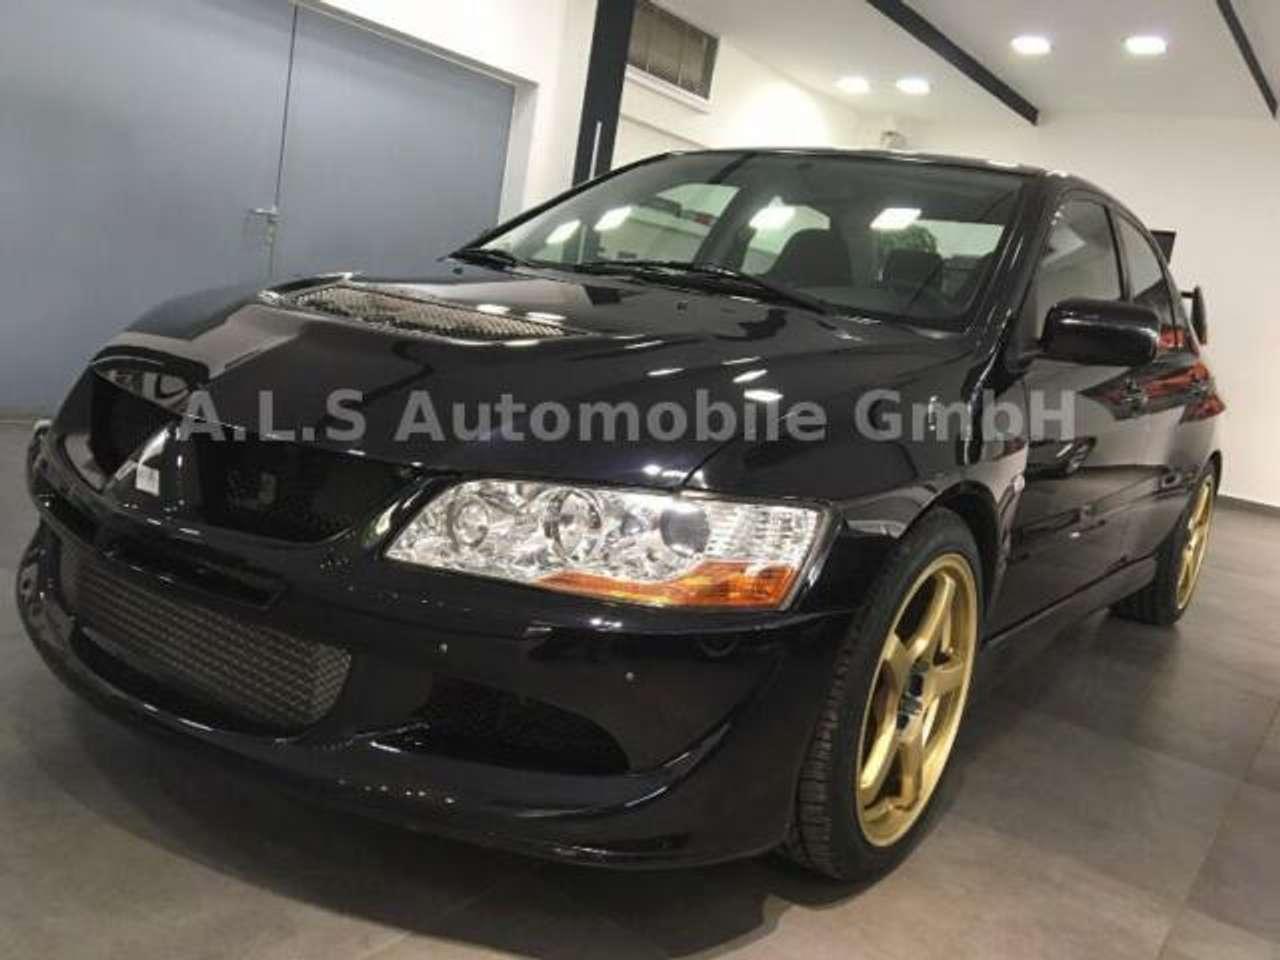 Autos nach Mitsubishi Lancer Evolution VIII 2.0 16V